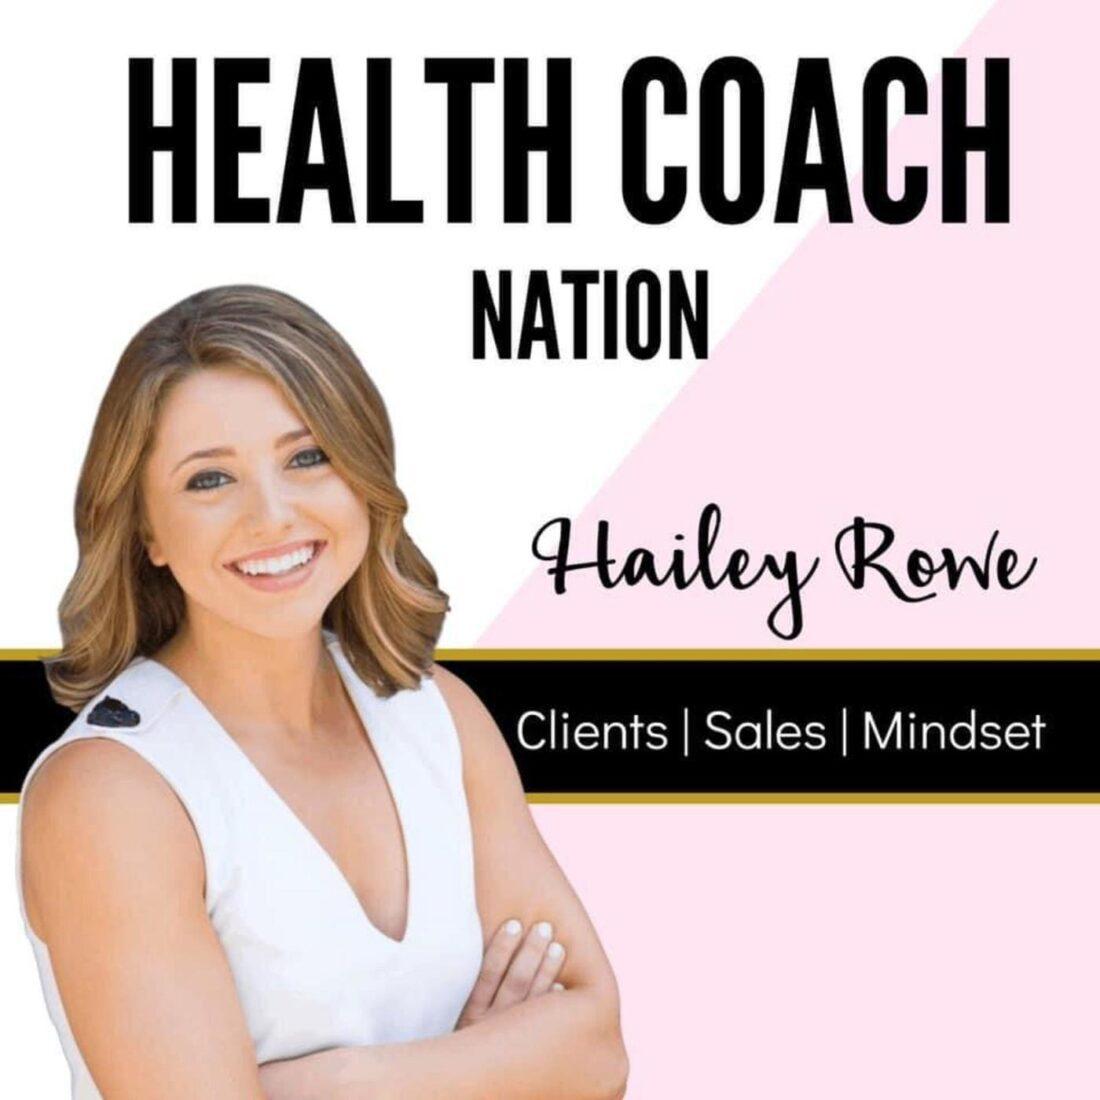 Heath Coach Nation